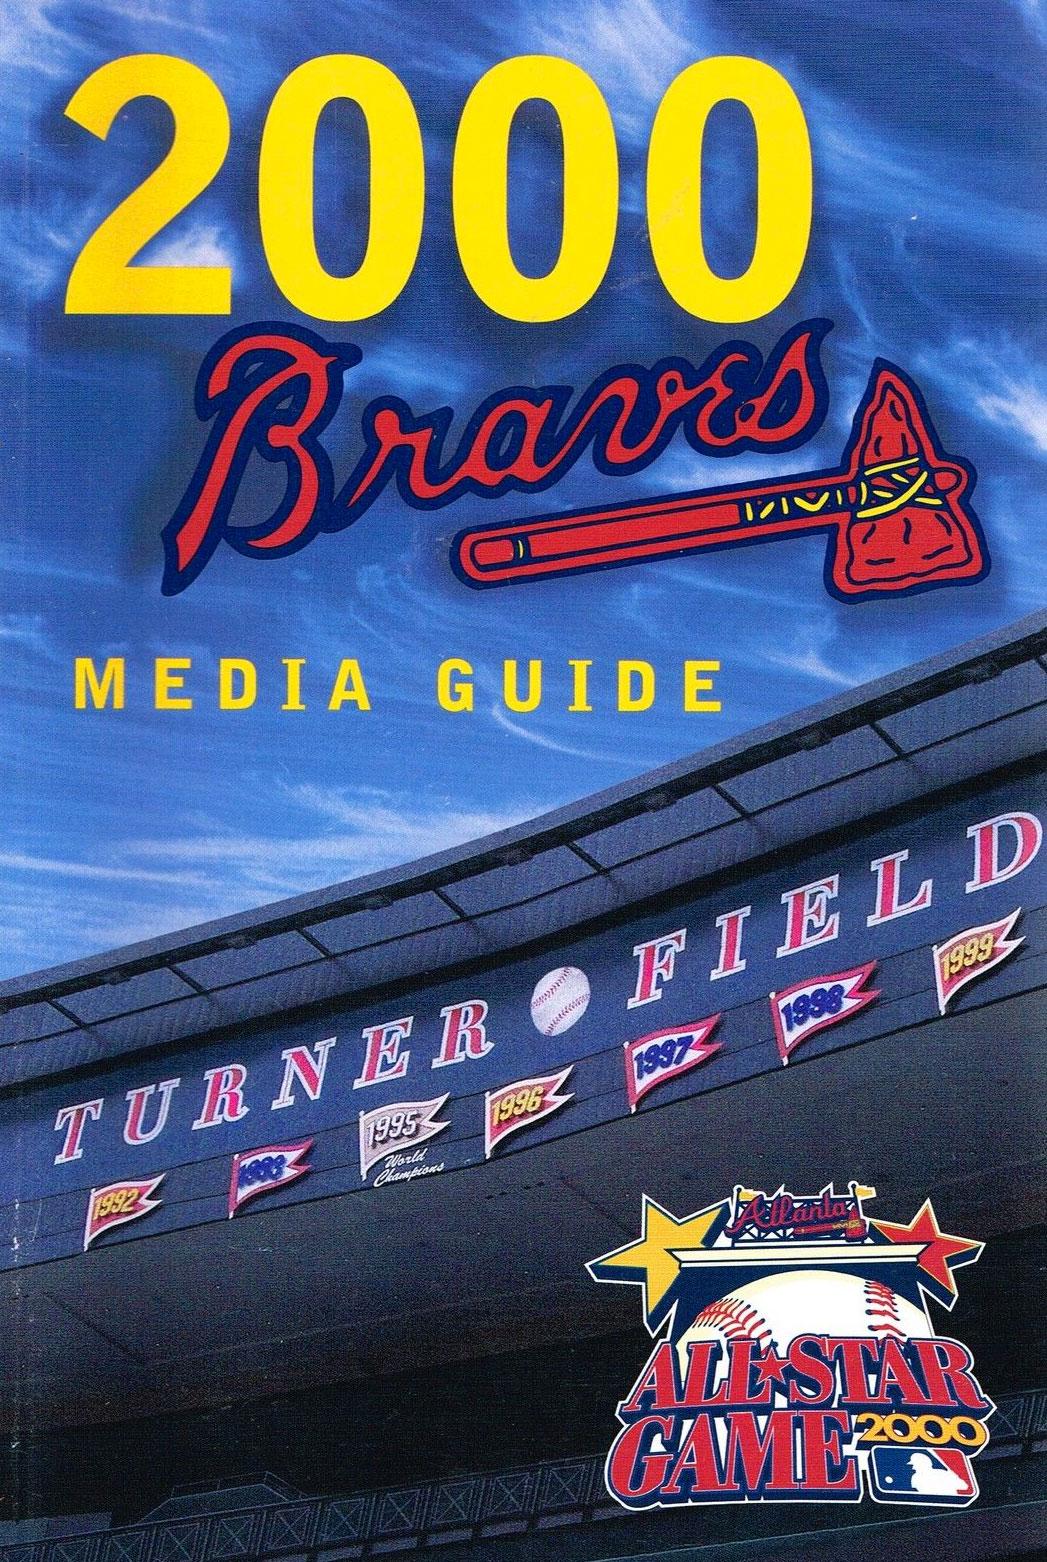 Atlanta Braves Media Guide Media Guide (2000) -  SportsLogos.Net